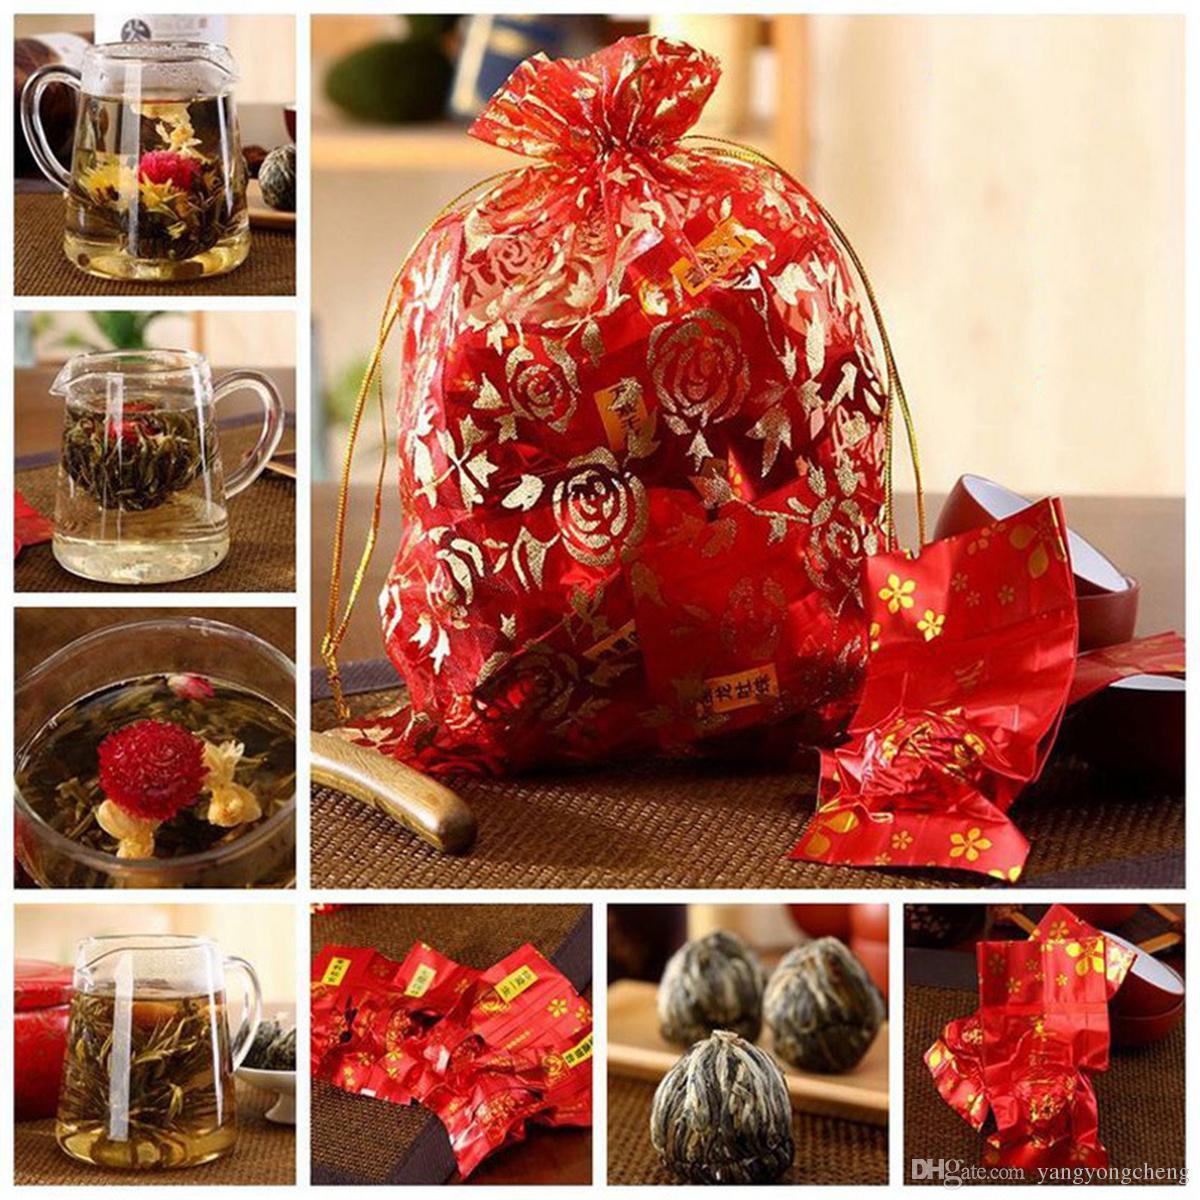 130g Chinese 16 Kinds of Handmade Blooming Flower Tea Herbal Great Fragrant Green Tea Herbal Scented Flower Botanical Herbs Green Food